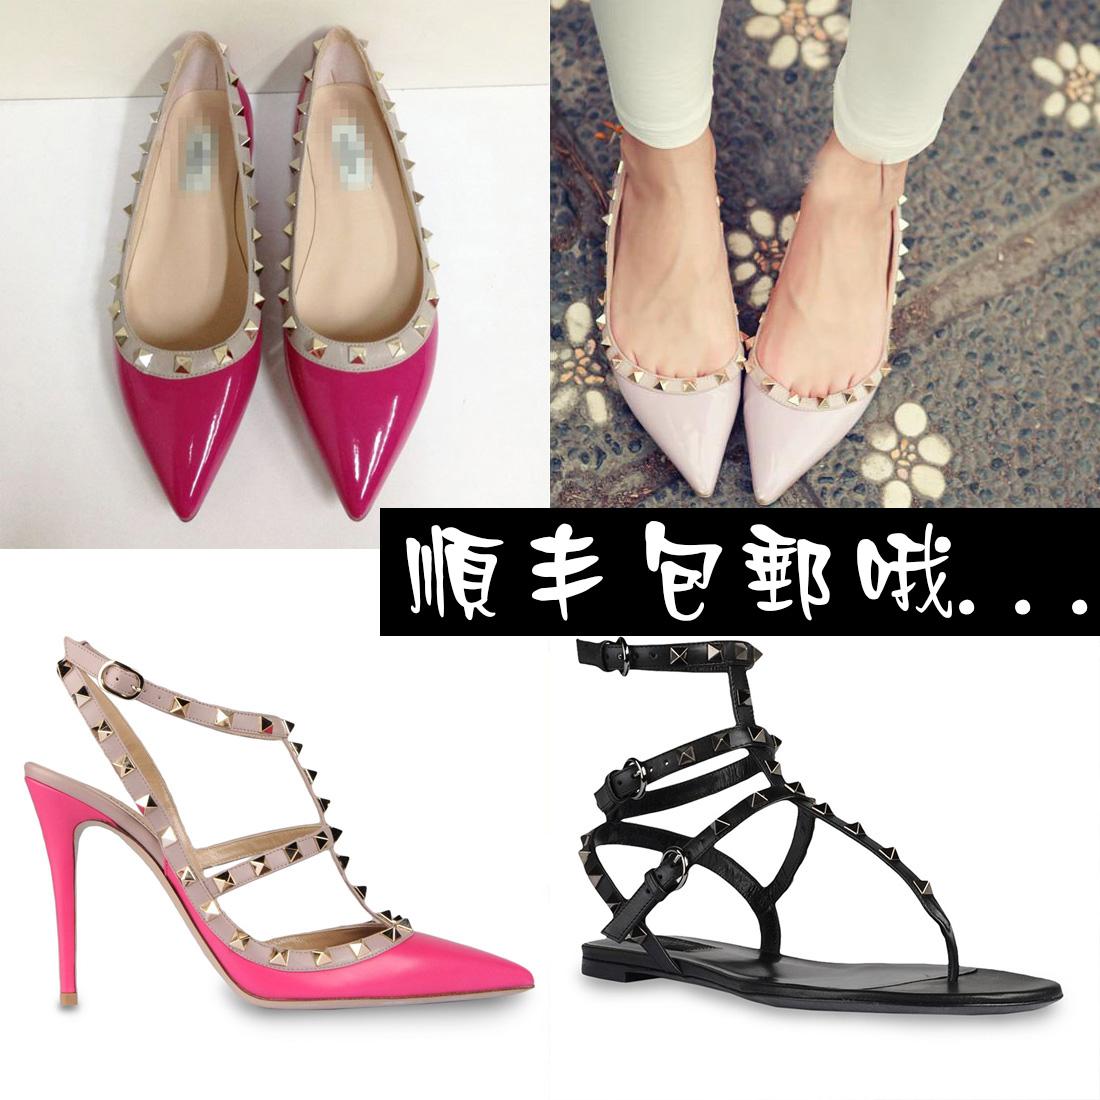 V家小辣椒valentino华伦天奴铆钉尖头平底鞋 浅口鞋女士平跟单鞋 价格:399.00